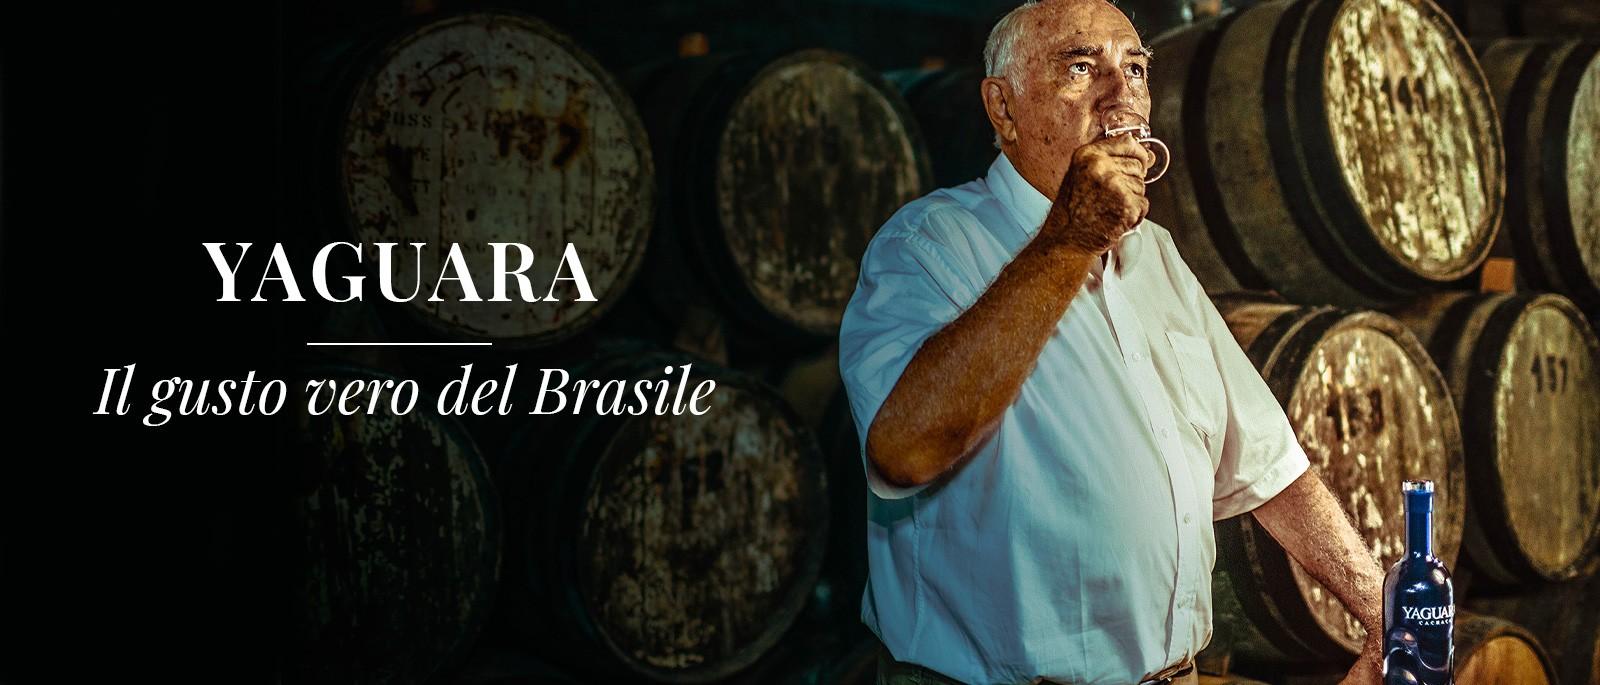 Il gusto vero del Brasile